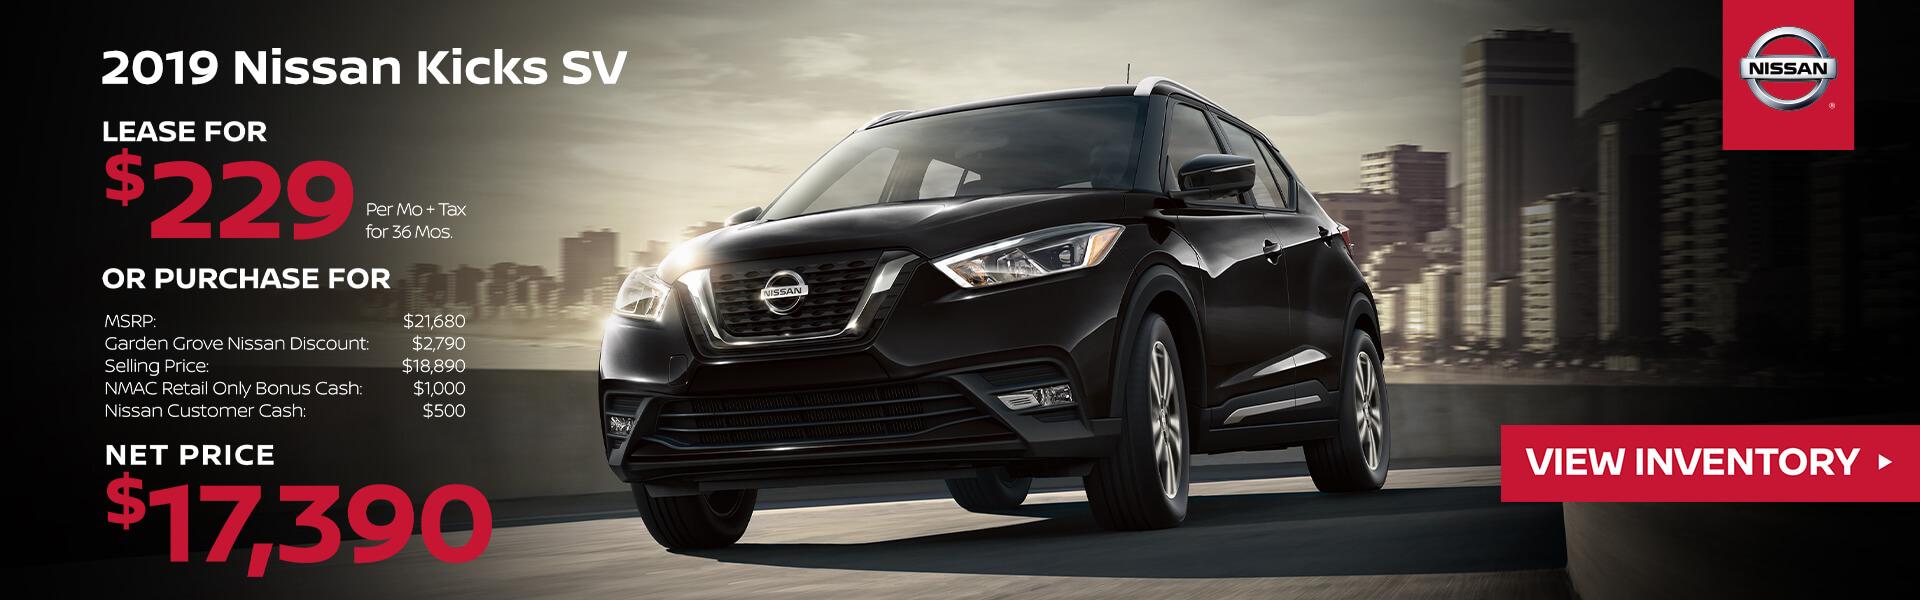 2019 Nissan Kicks Lease for $229